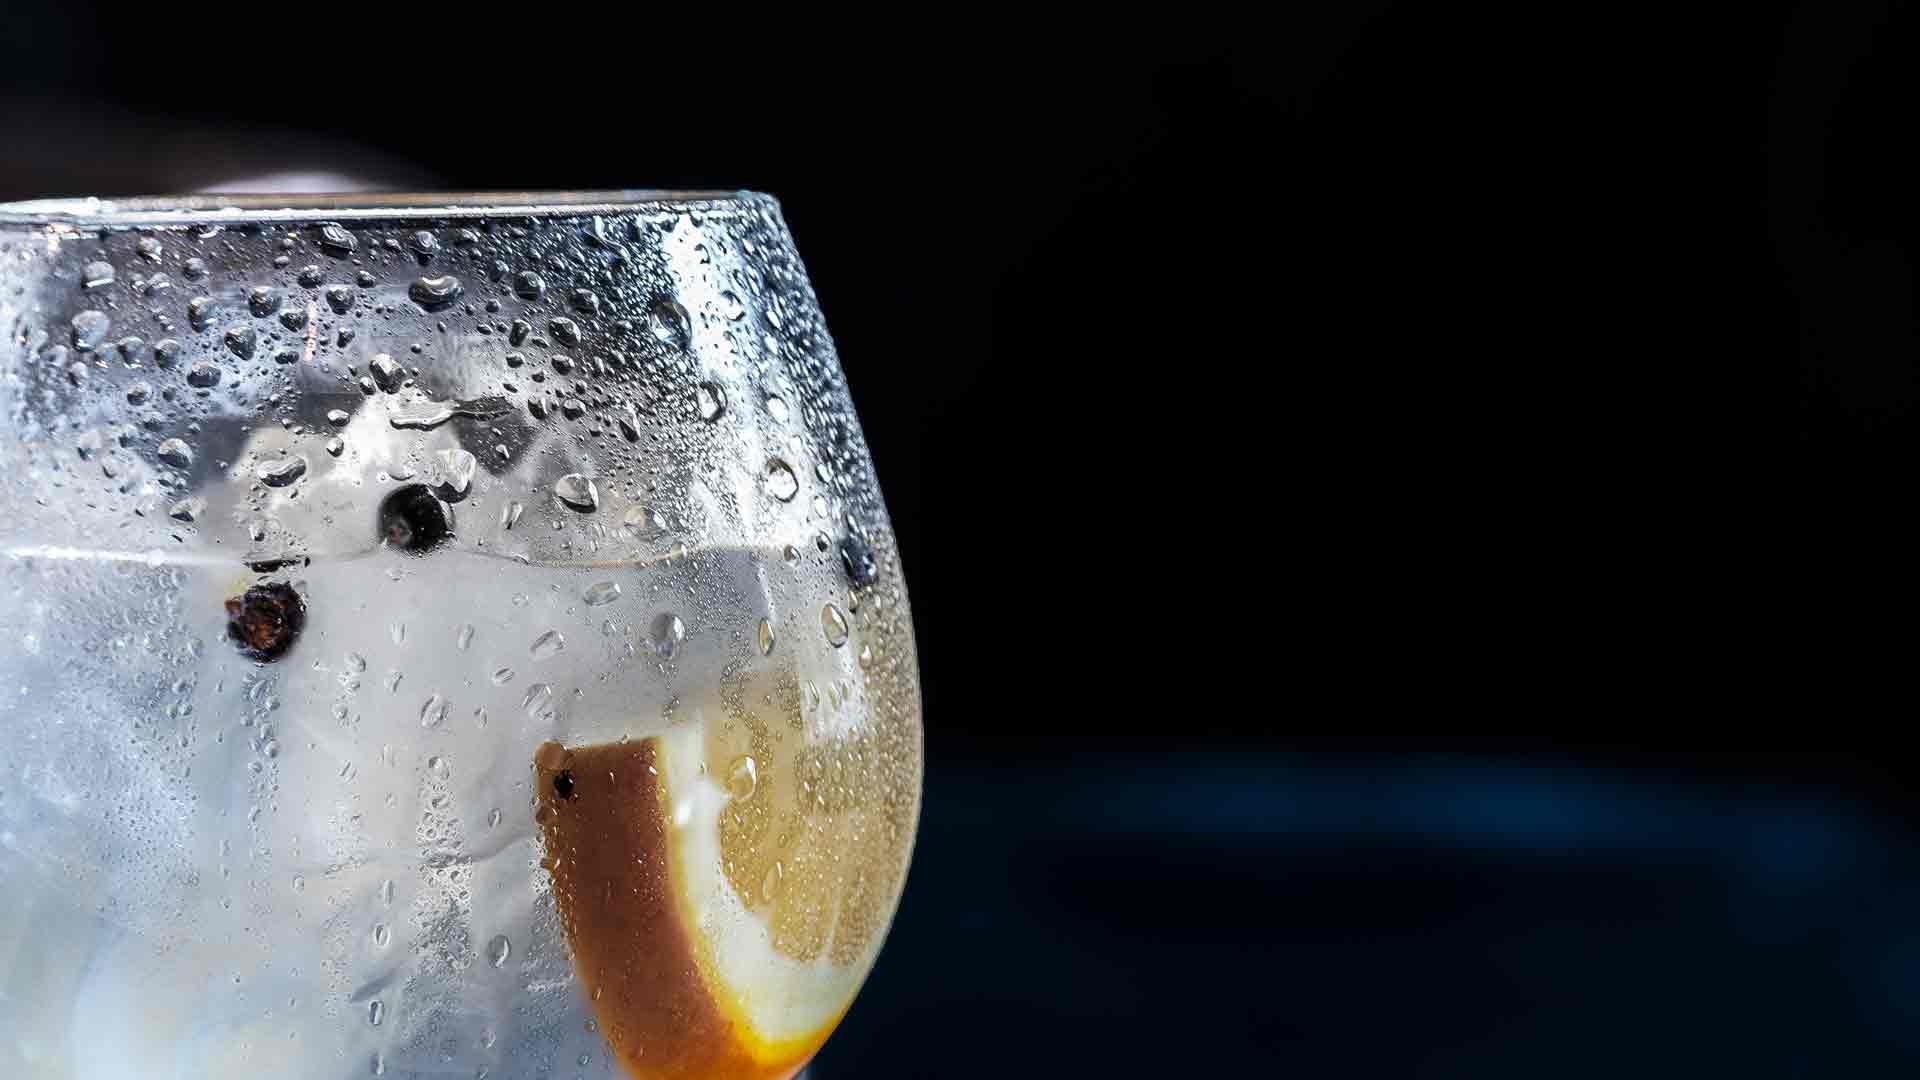 5-aspectos-curiosos-sobre-el-alcohol-1920